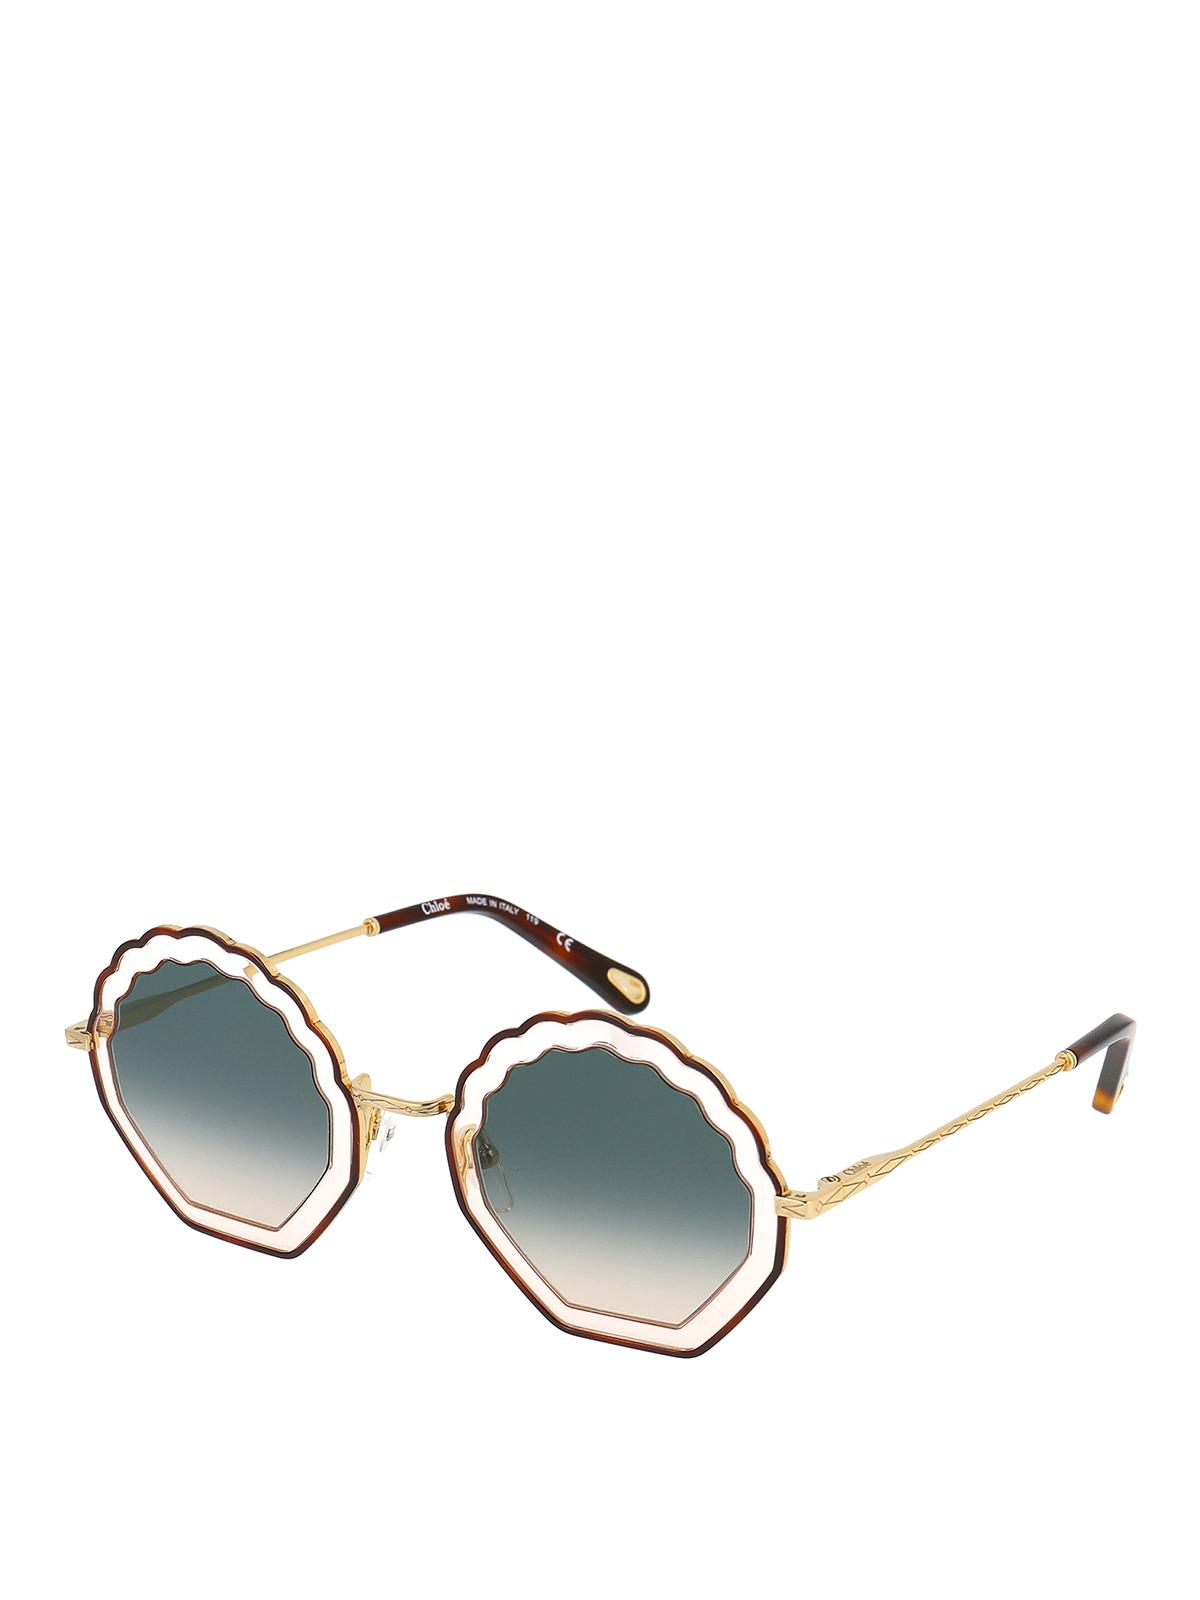 Chloé Sunglasses SCALLOPED GRADIENT LENS SUNGLASSES